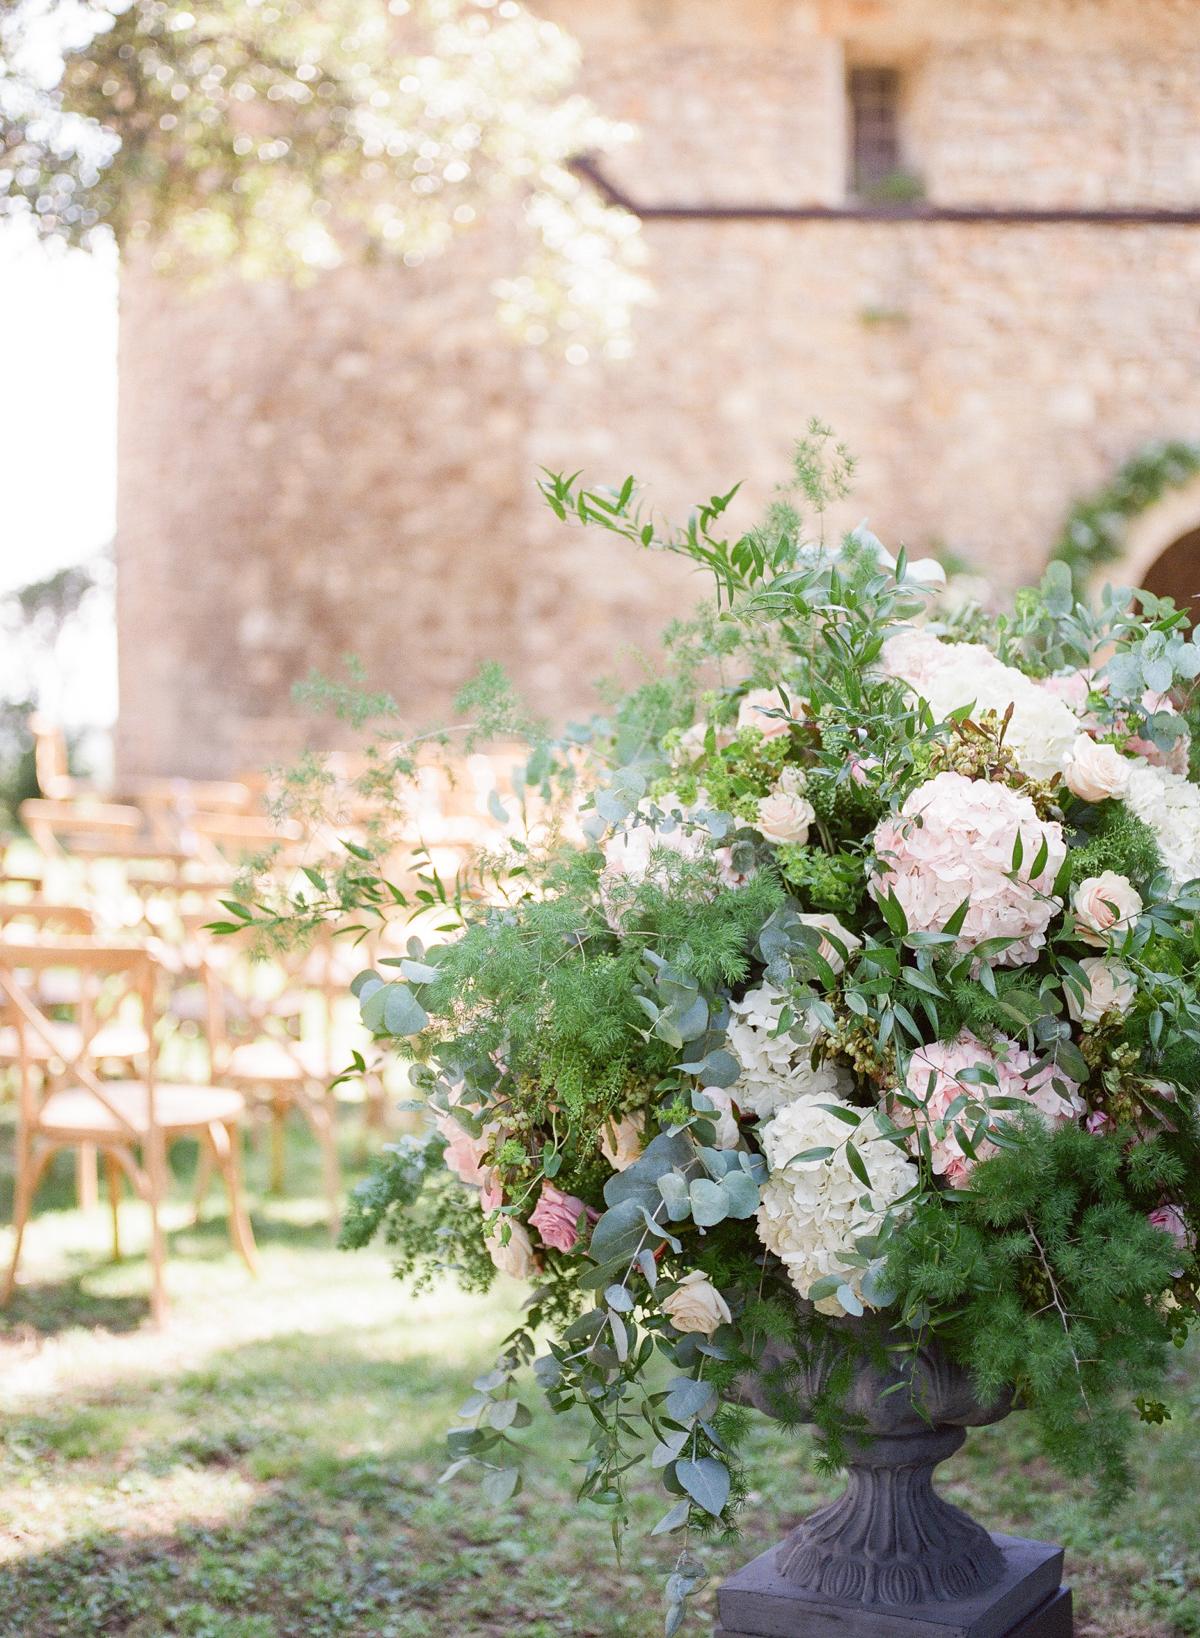 French_Wedding_(c)_Rory_Wylie-2.jpg